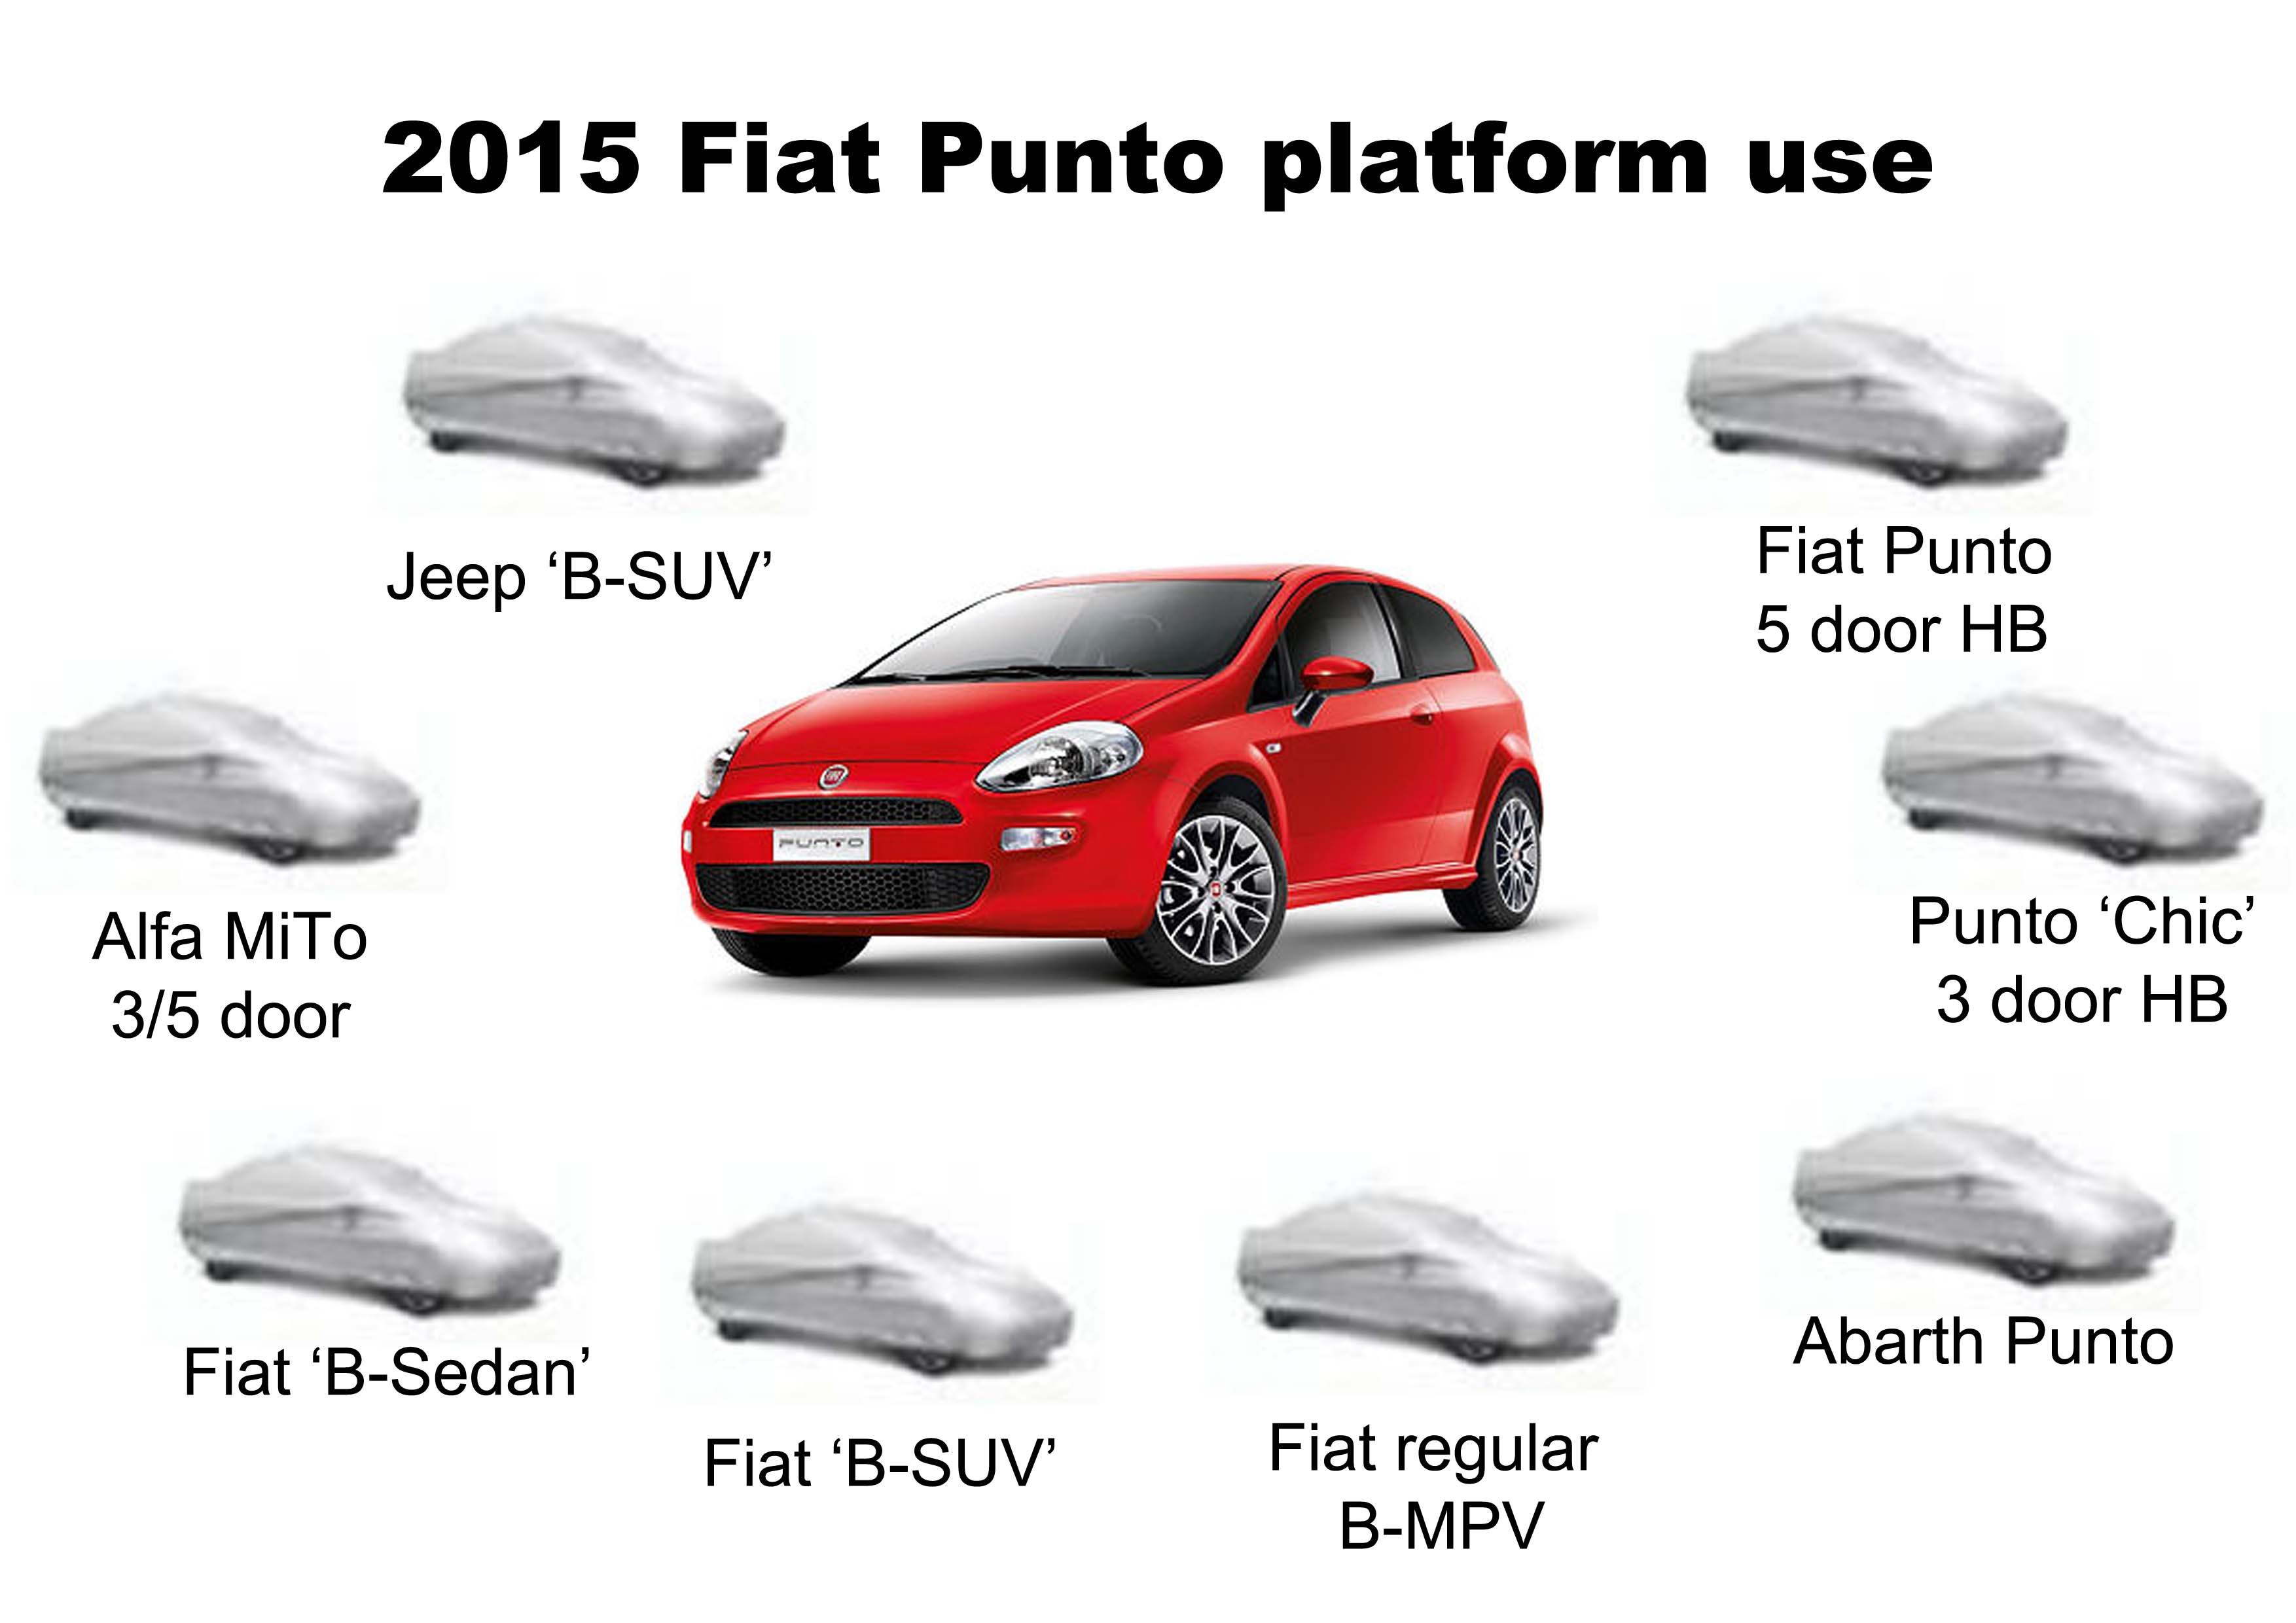 Fiat Punto 2015 3